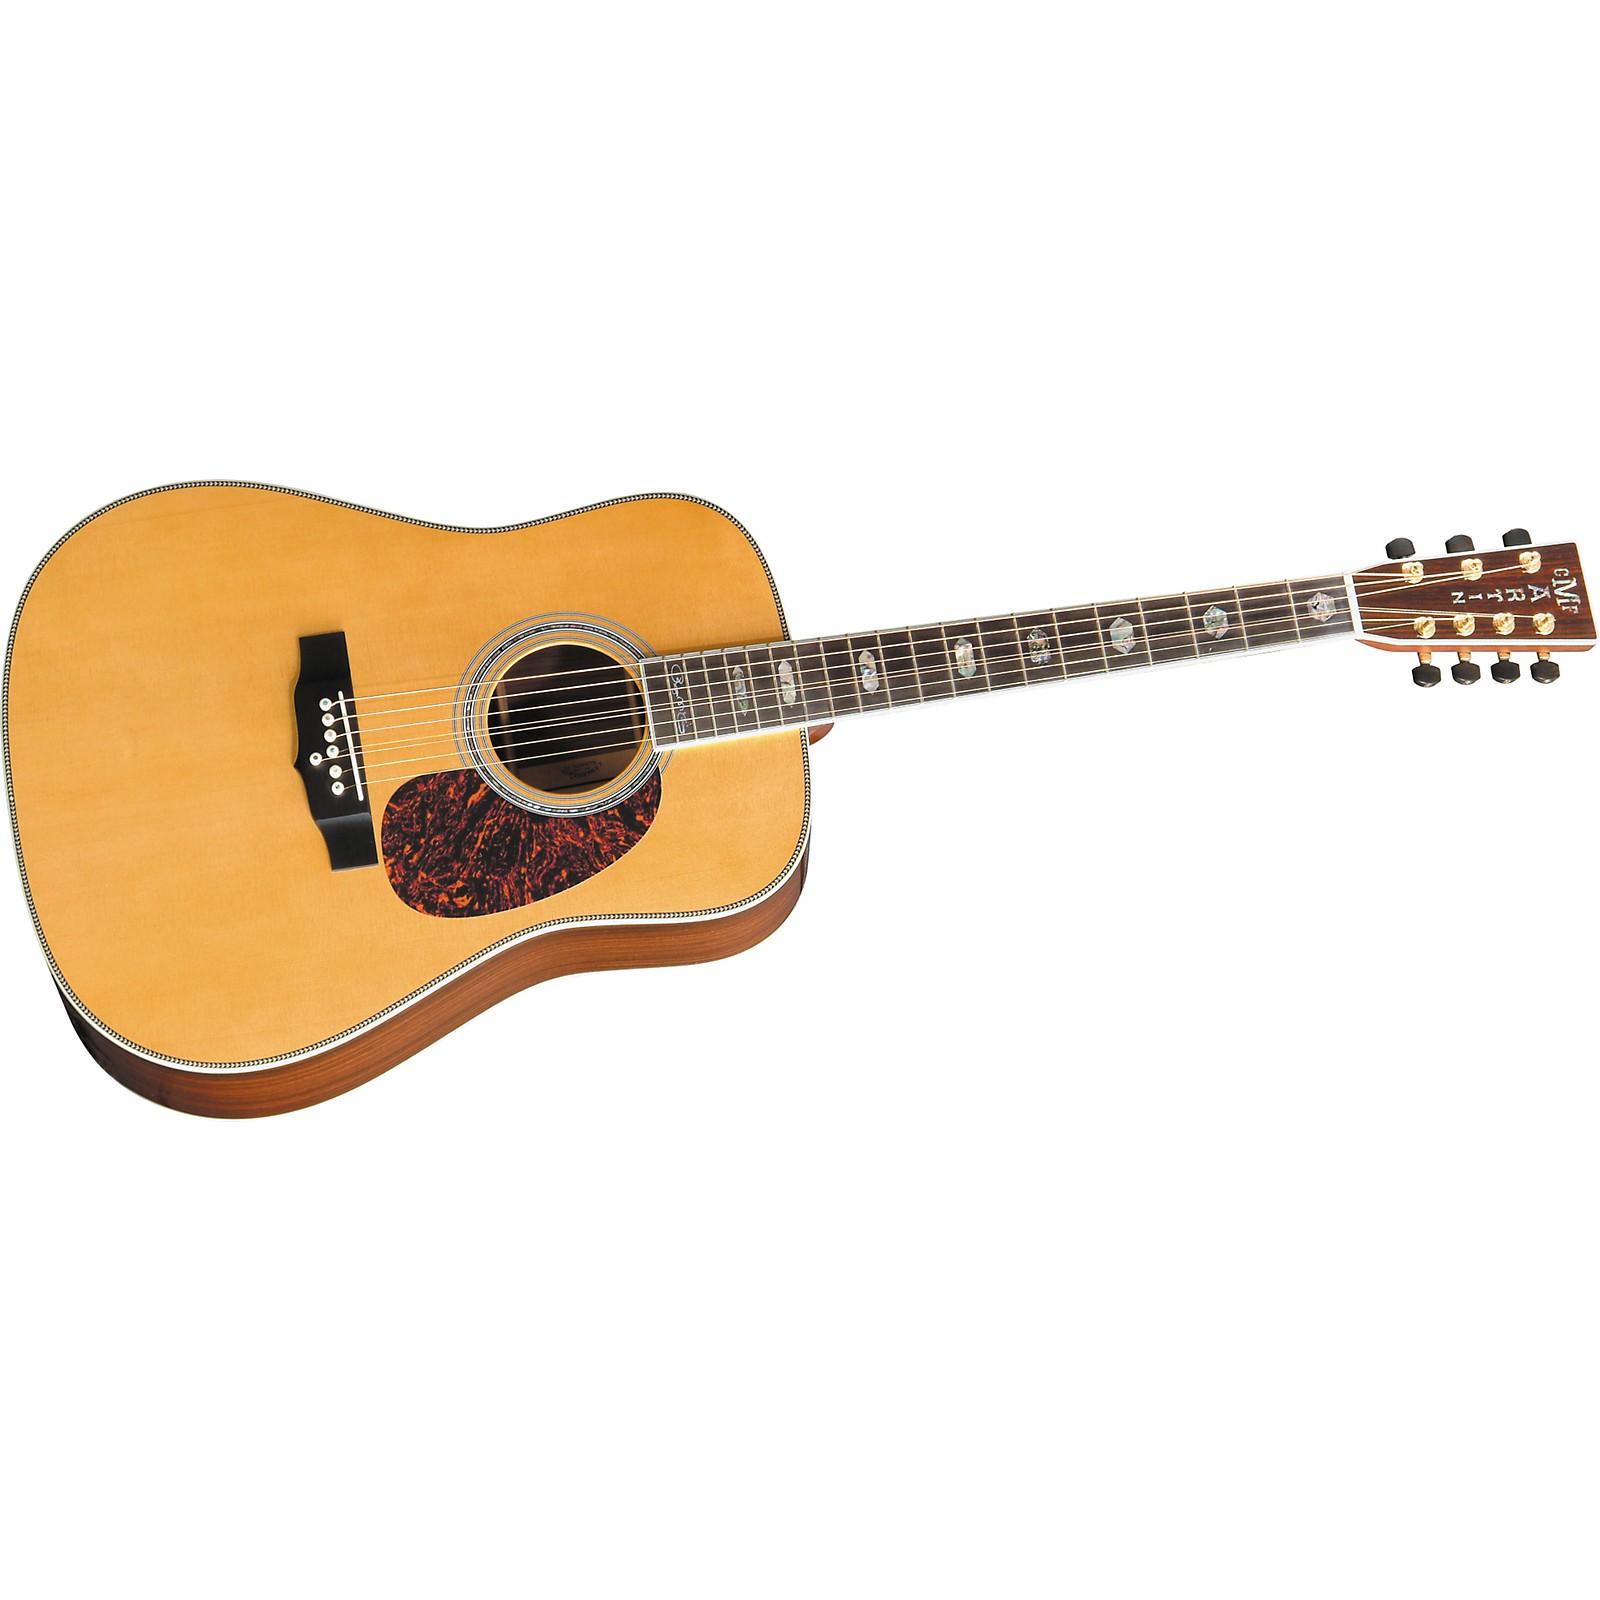 Martin HD-7 Roger McGuinn Acoustic Guitar